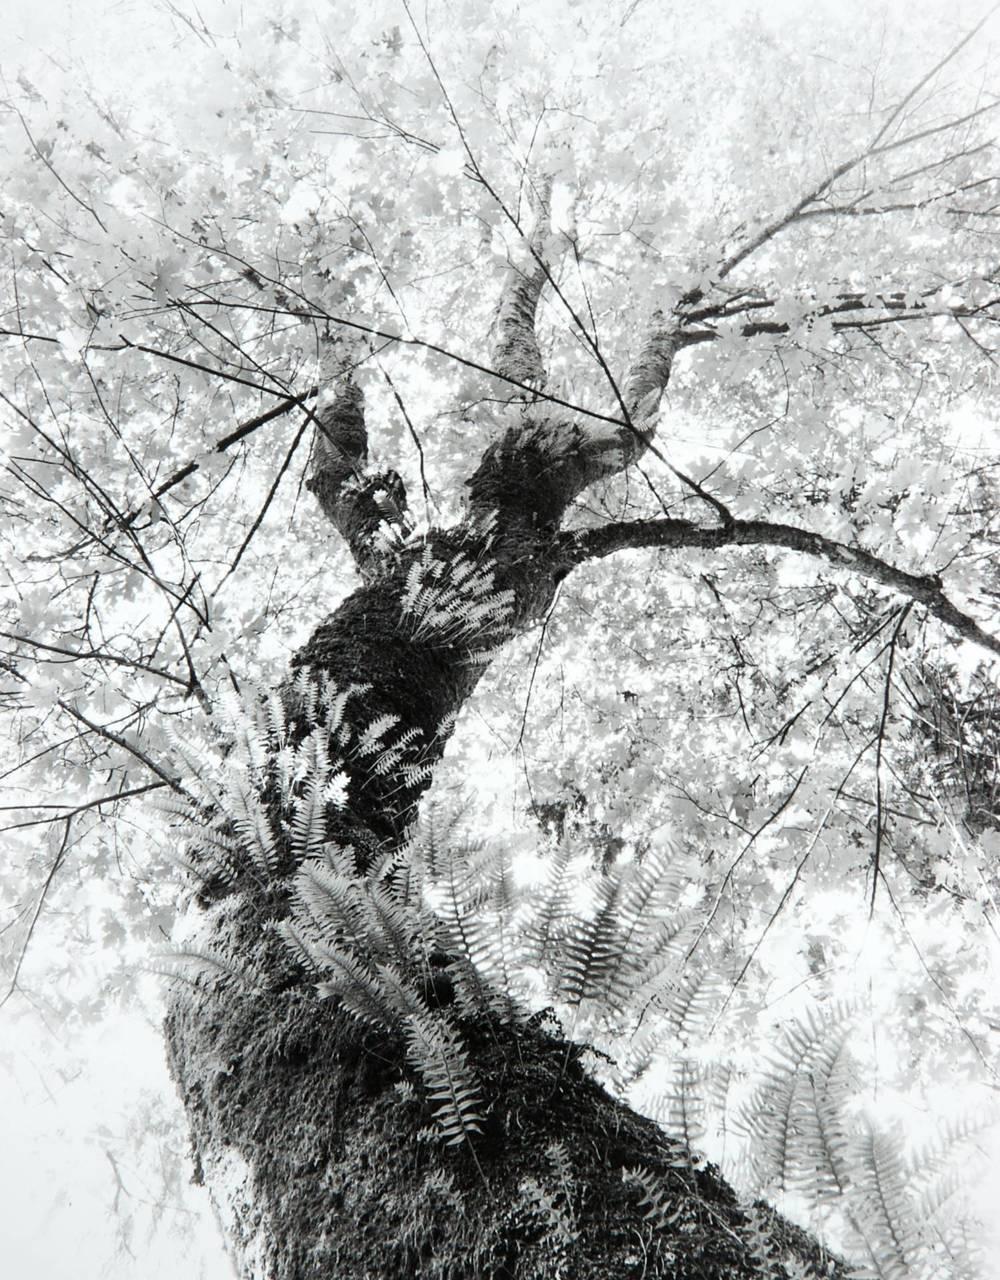 Stanley Park Tree (Vancouver, British Columbia)